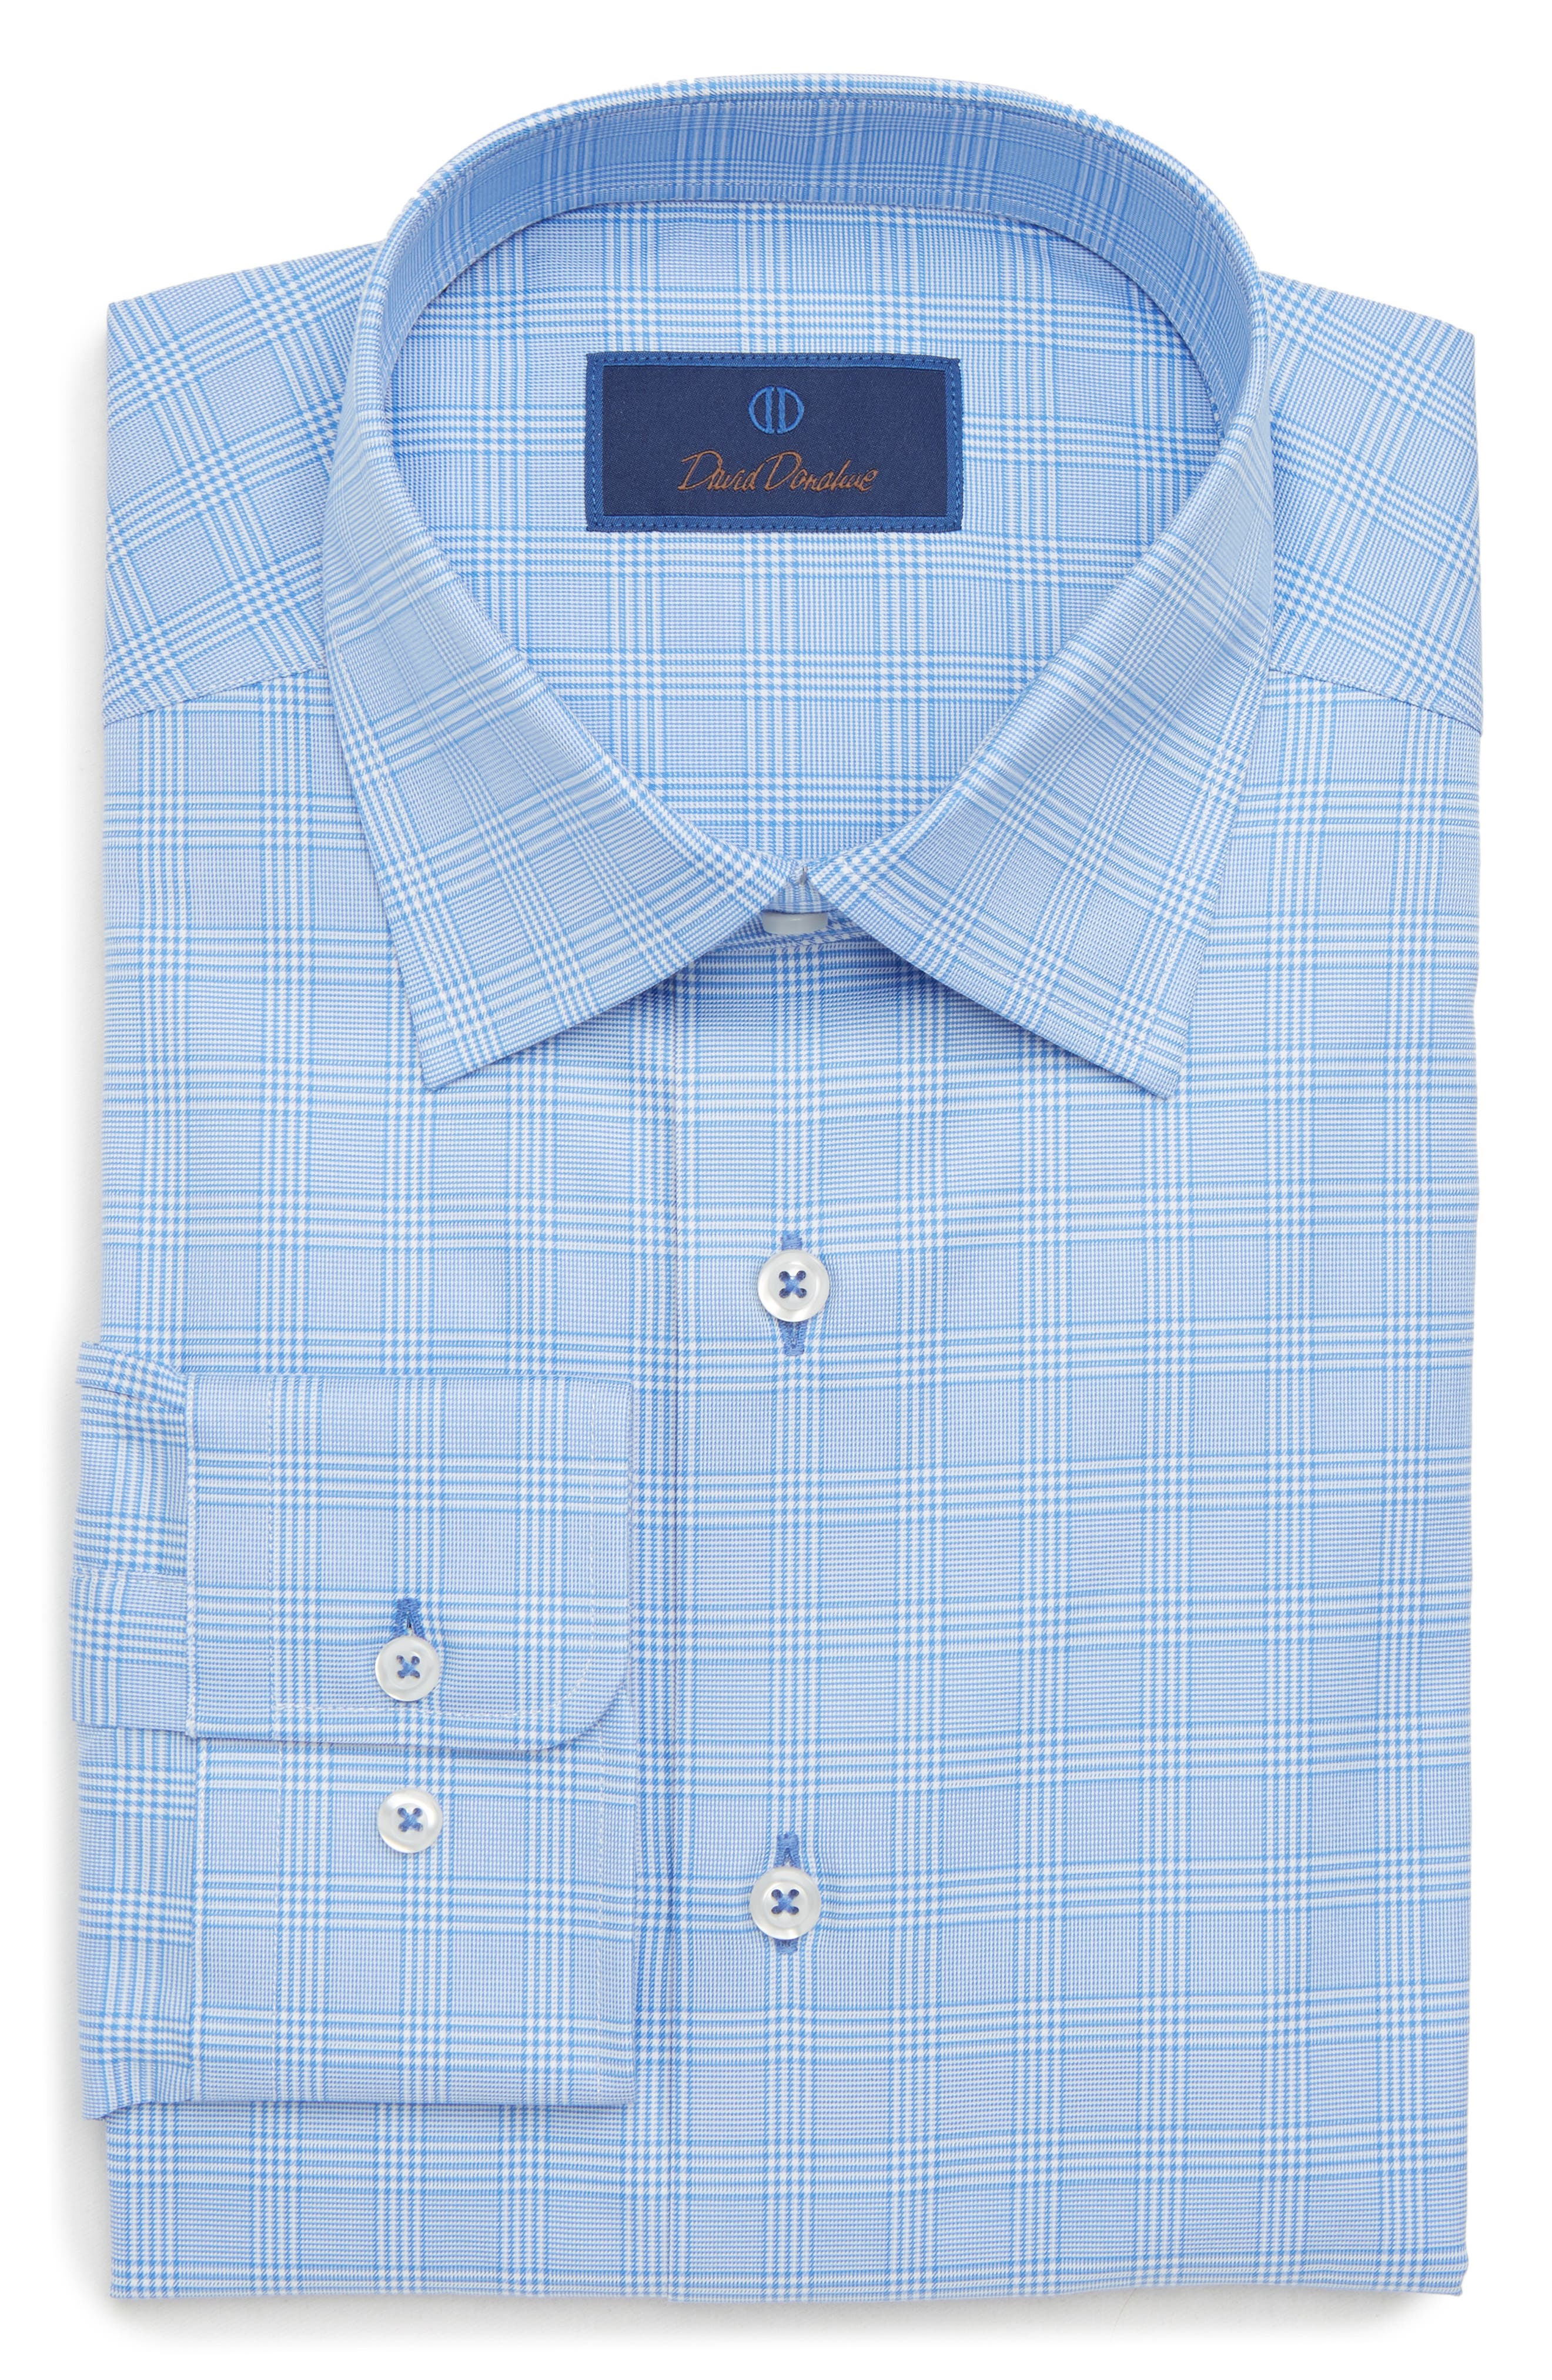 Regular Fit Plaid Dress Shirt,                             Alternate thumbnail 5, color,                             BLUE